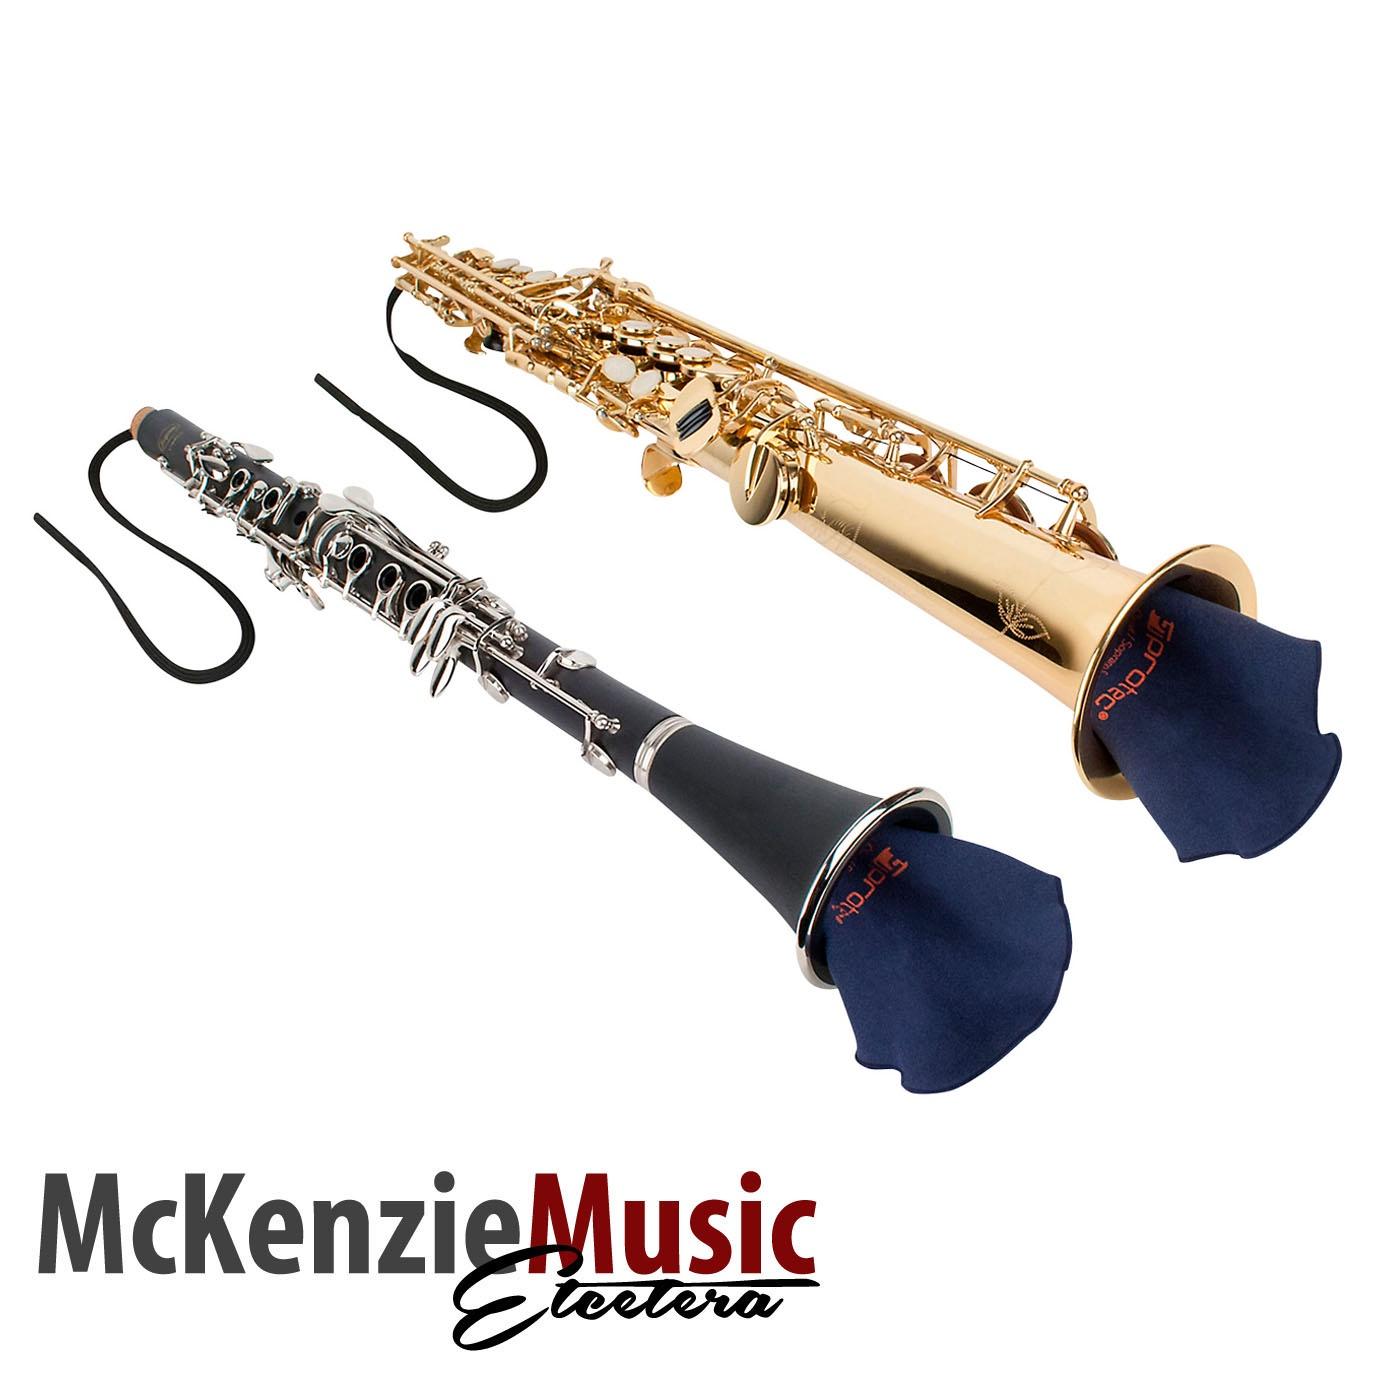 Protec Clarinet/Soprano Sax Body Swab